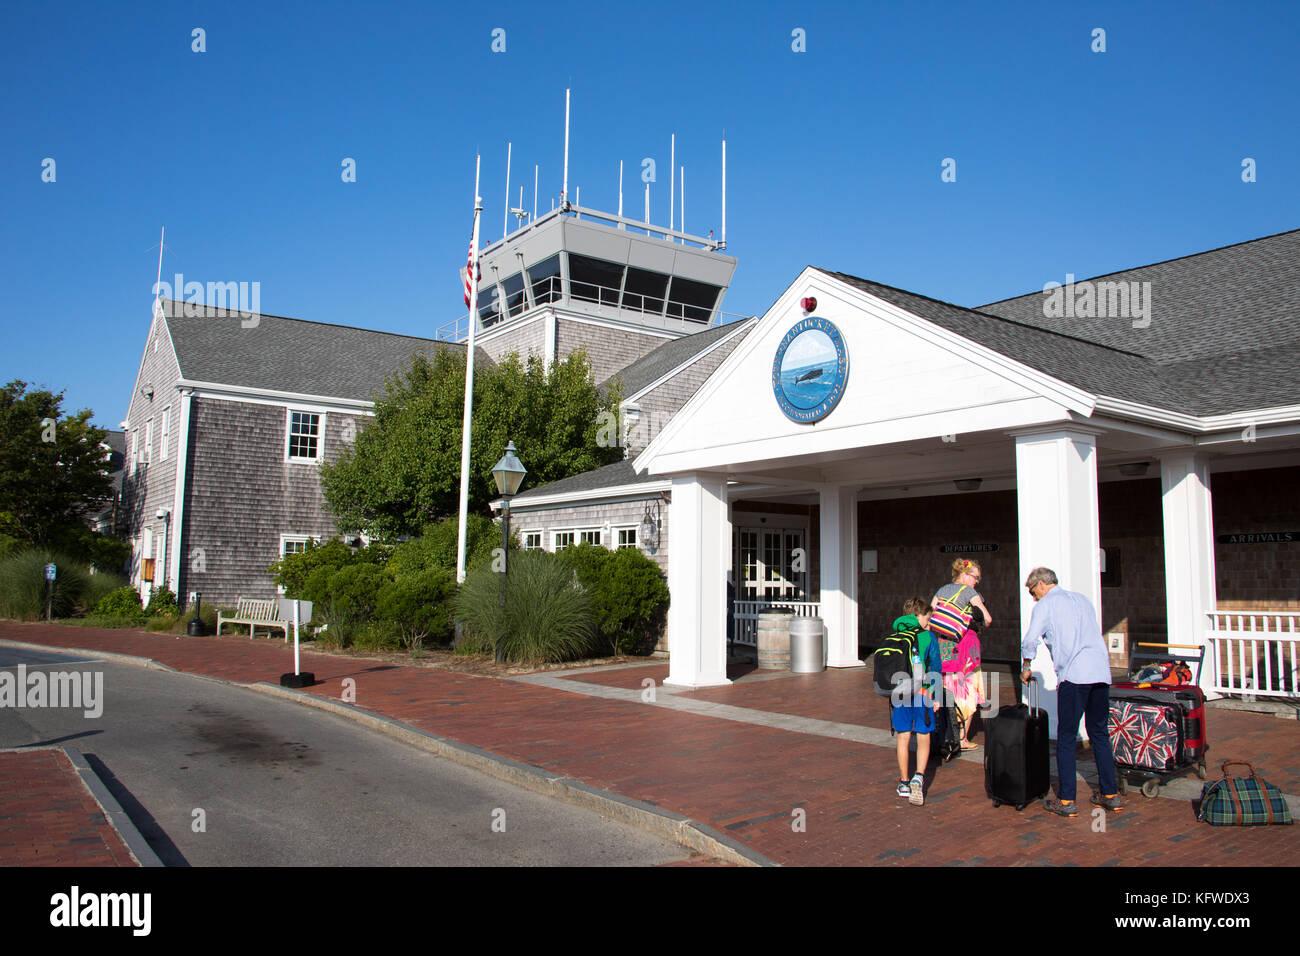 Nantucket Memorial Airport, ACK, Nantucket, Massachusetts, USA - Stock Image